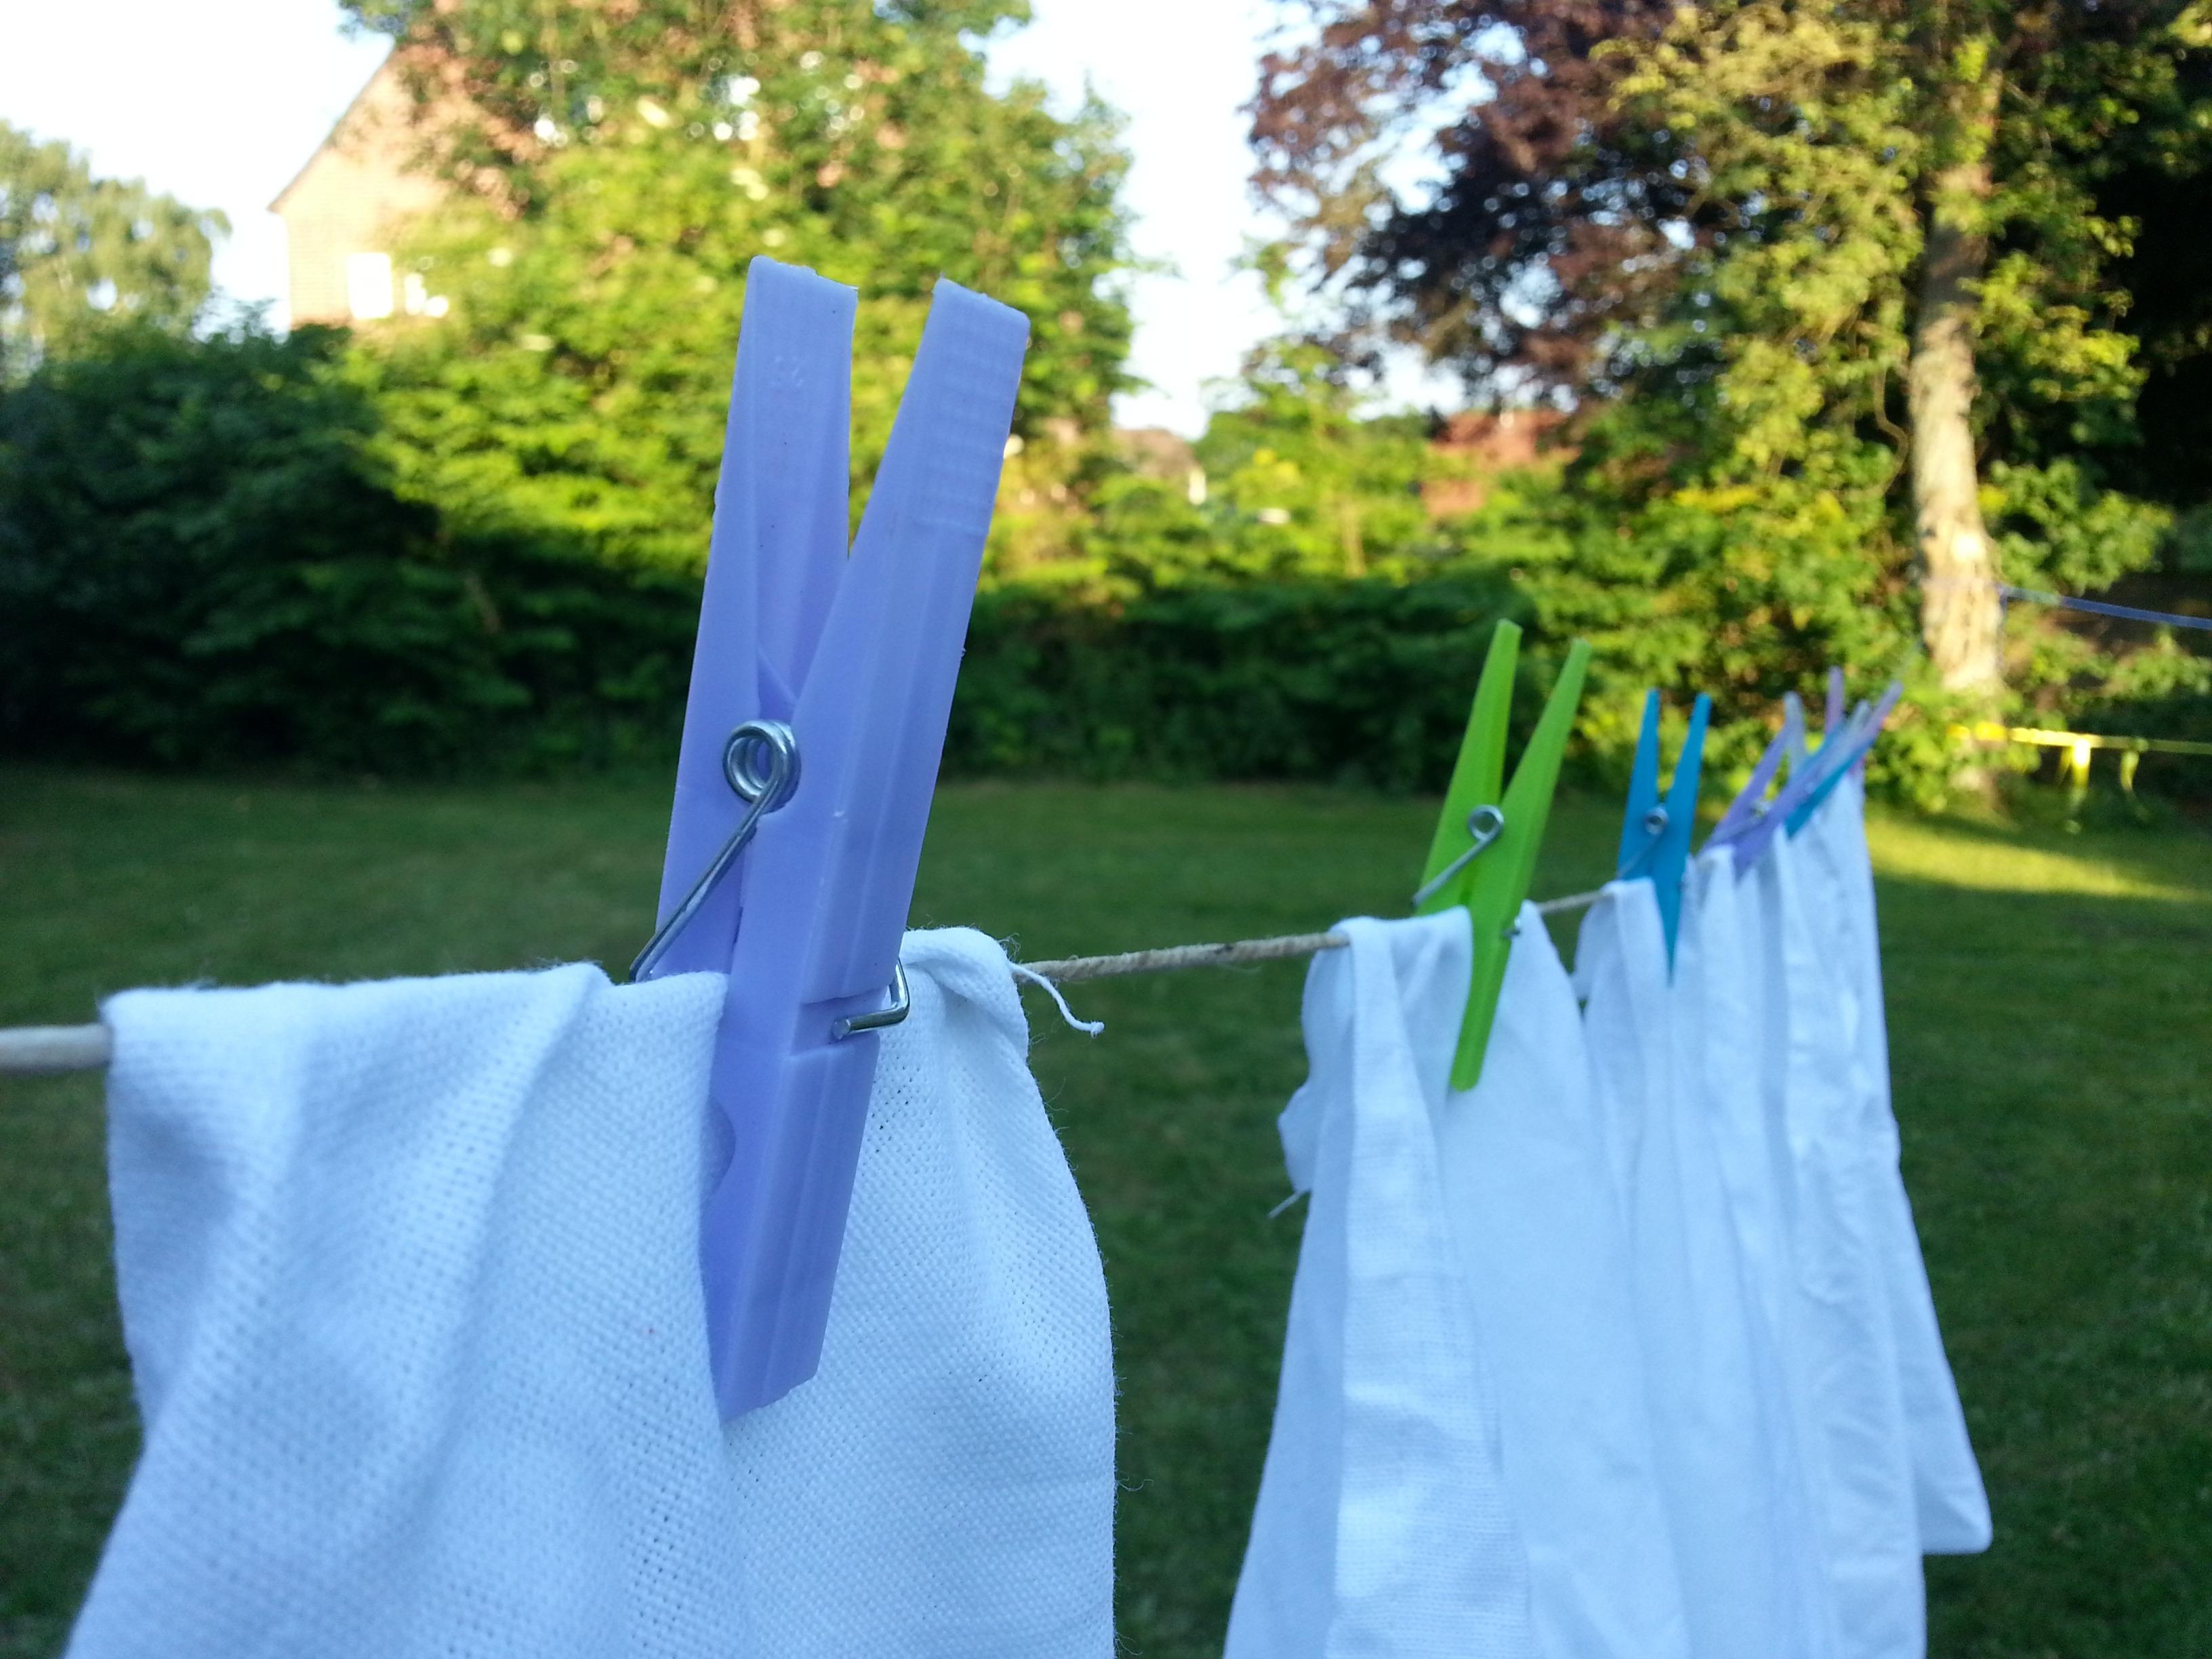 Gambar Halaman Rumput Kering Halaman Belakang Mencuci Biru